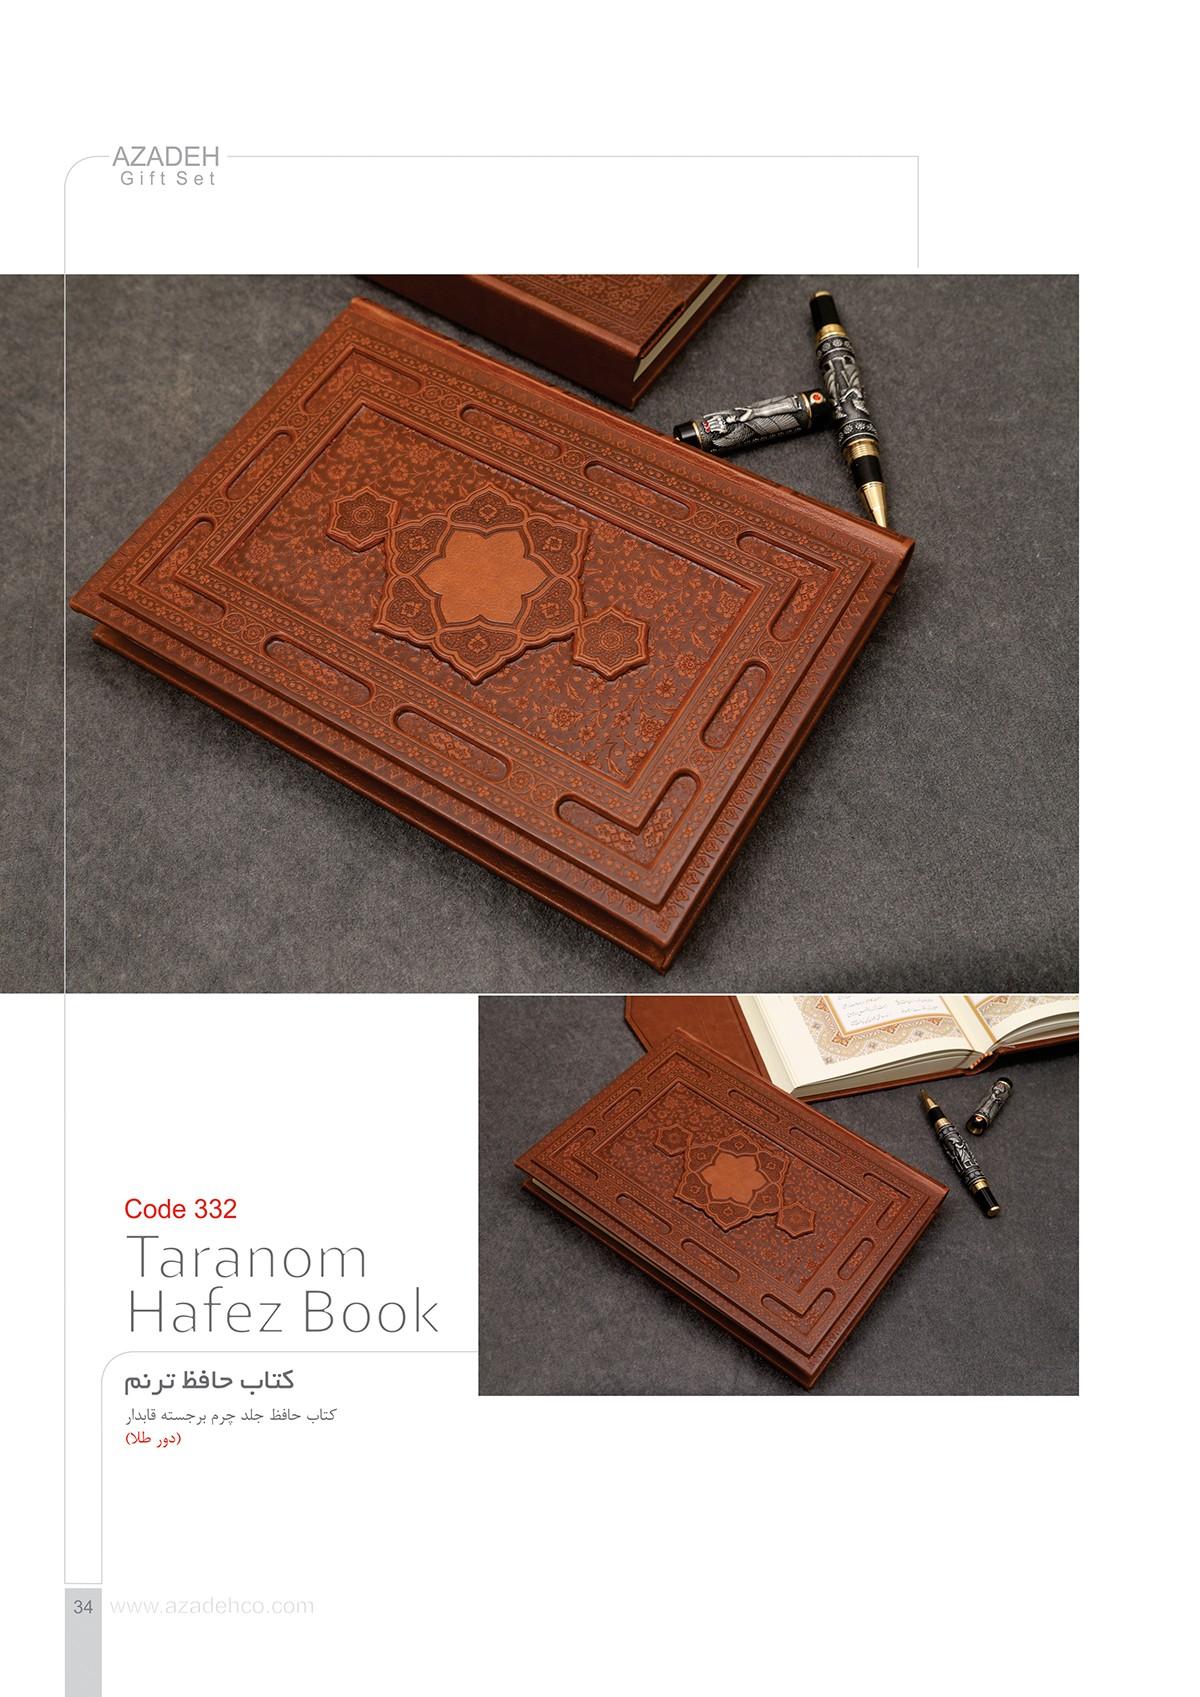 کتاب حافظ ترنم کد 332